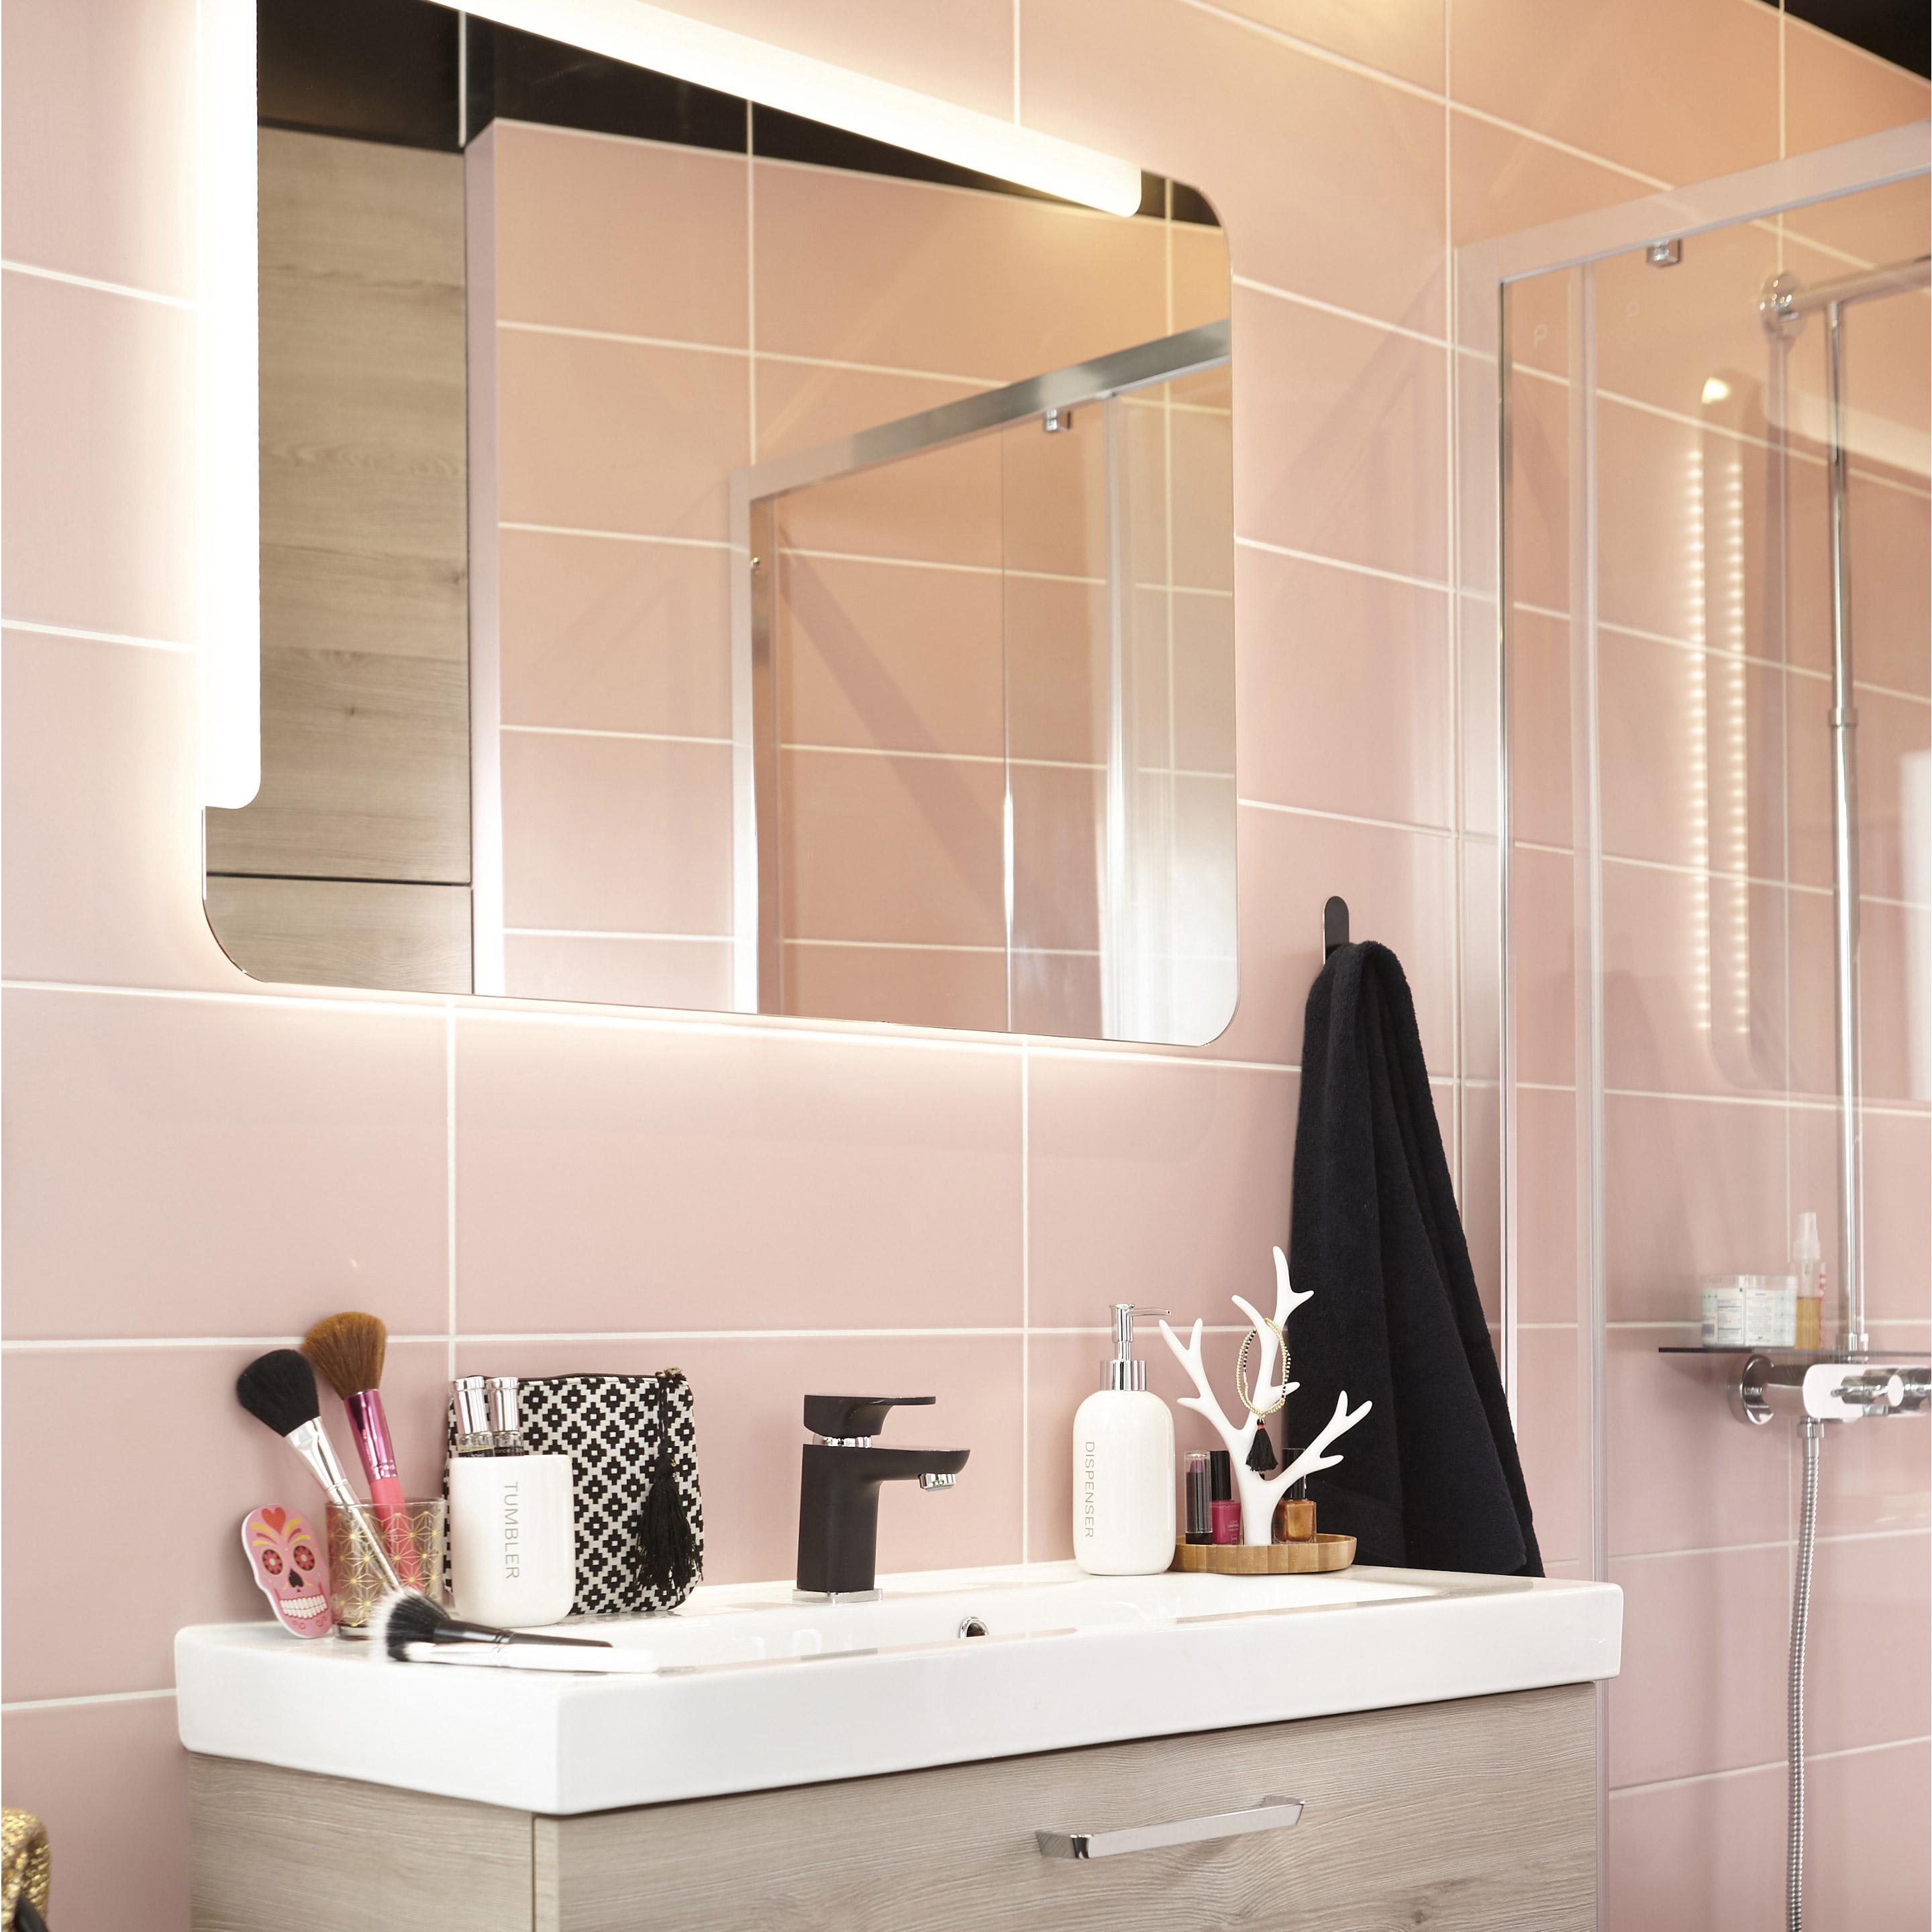 Faïence mur rose blush n°5 mat l.20 x L.50.2 cm, Loft